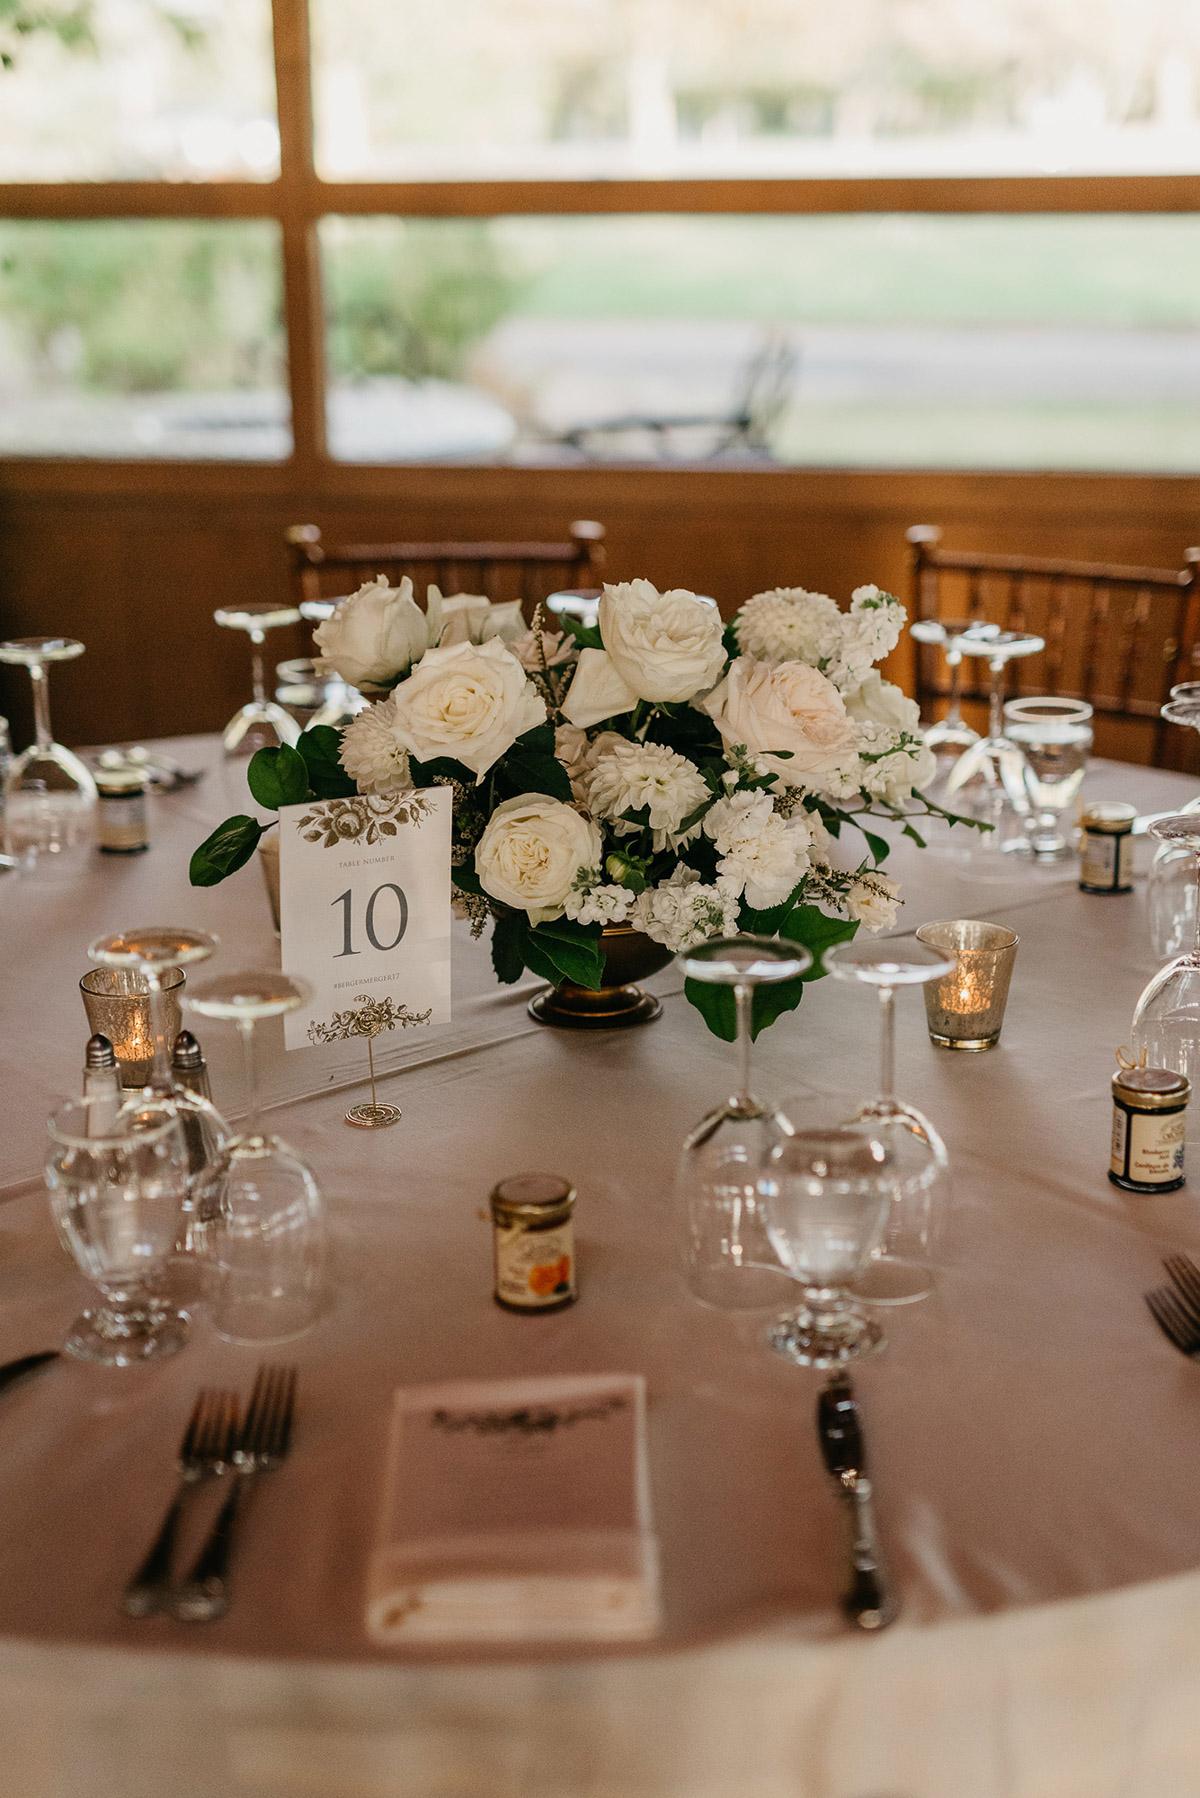 shaw-events-vineyard-bride-swish-list-kurtz-orchards-niagara-on-the-lake-wedding-44.jpg